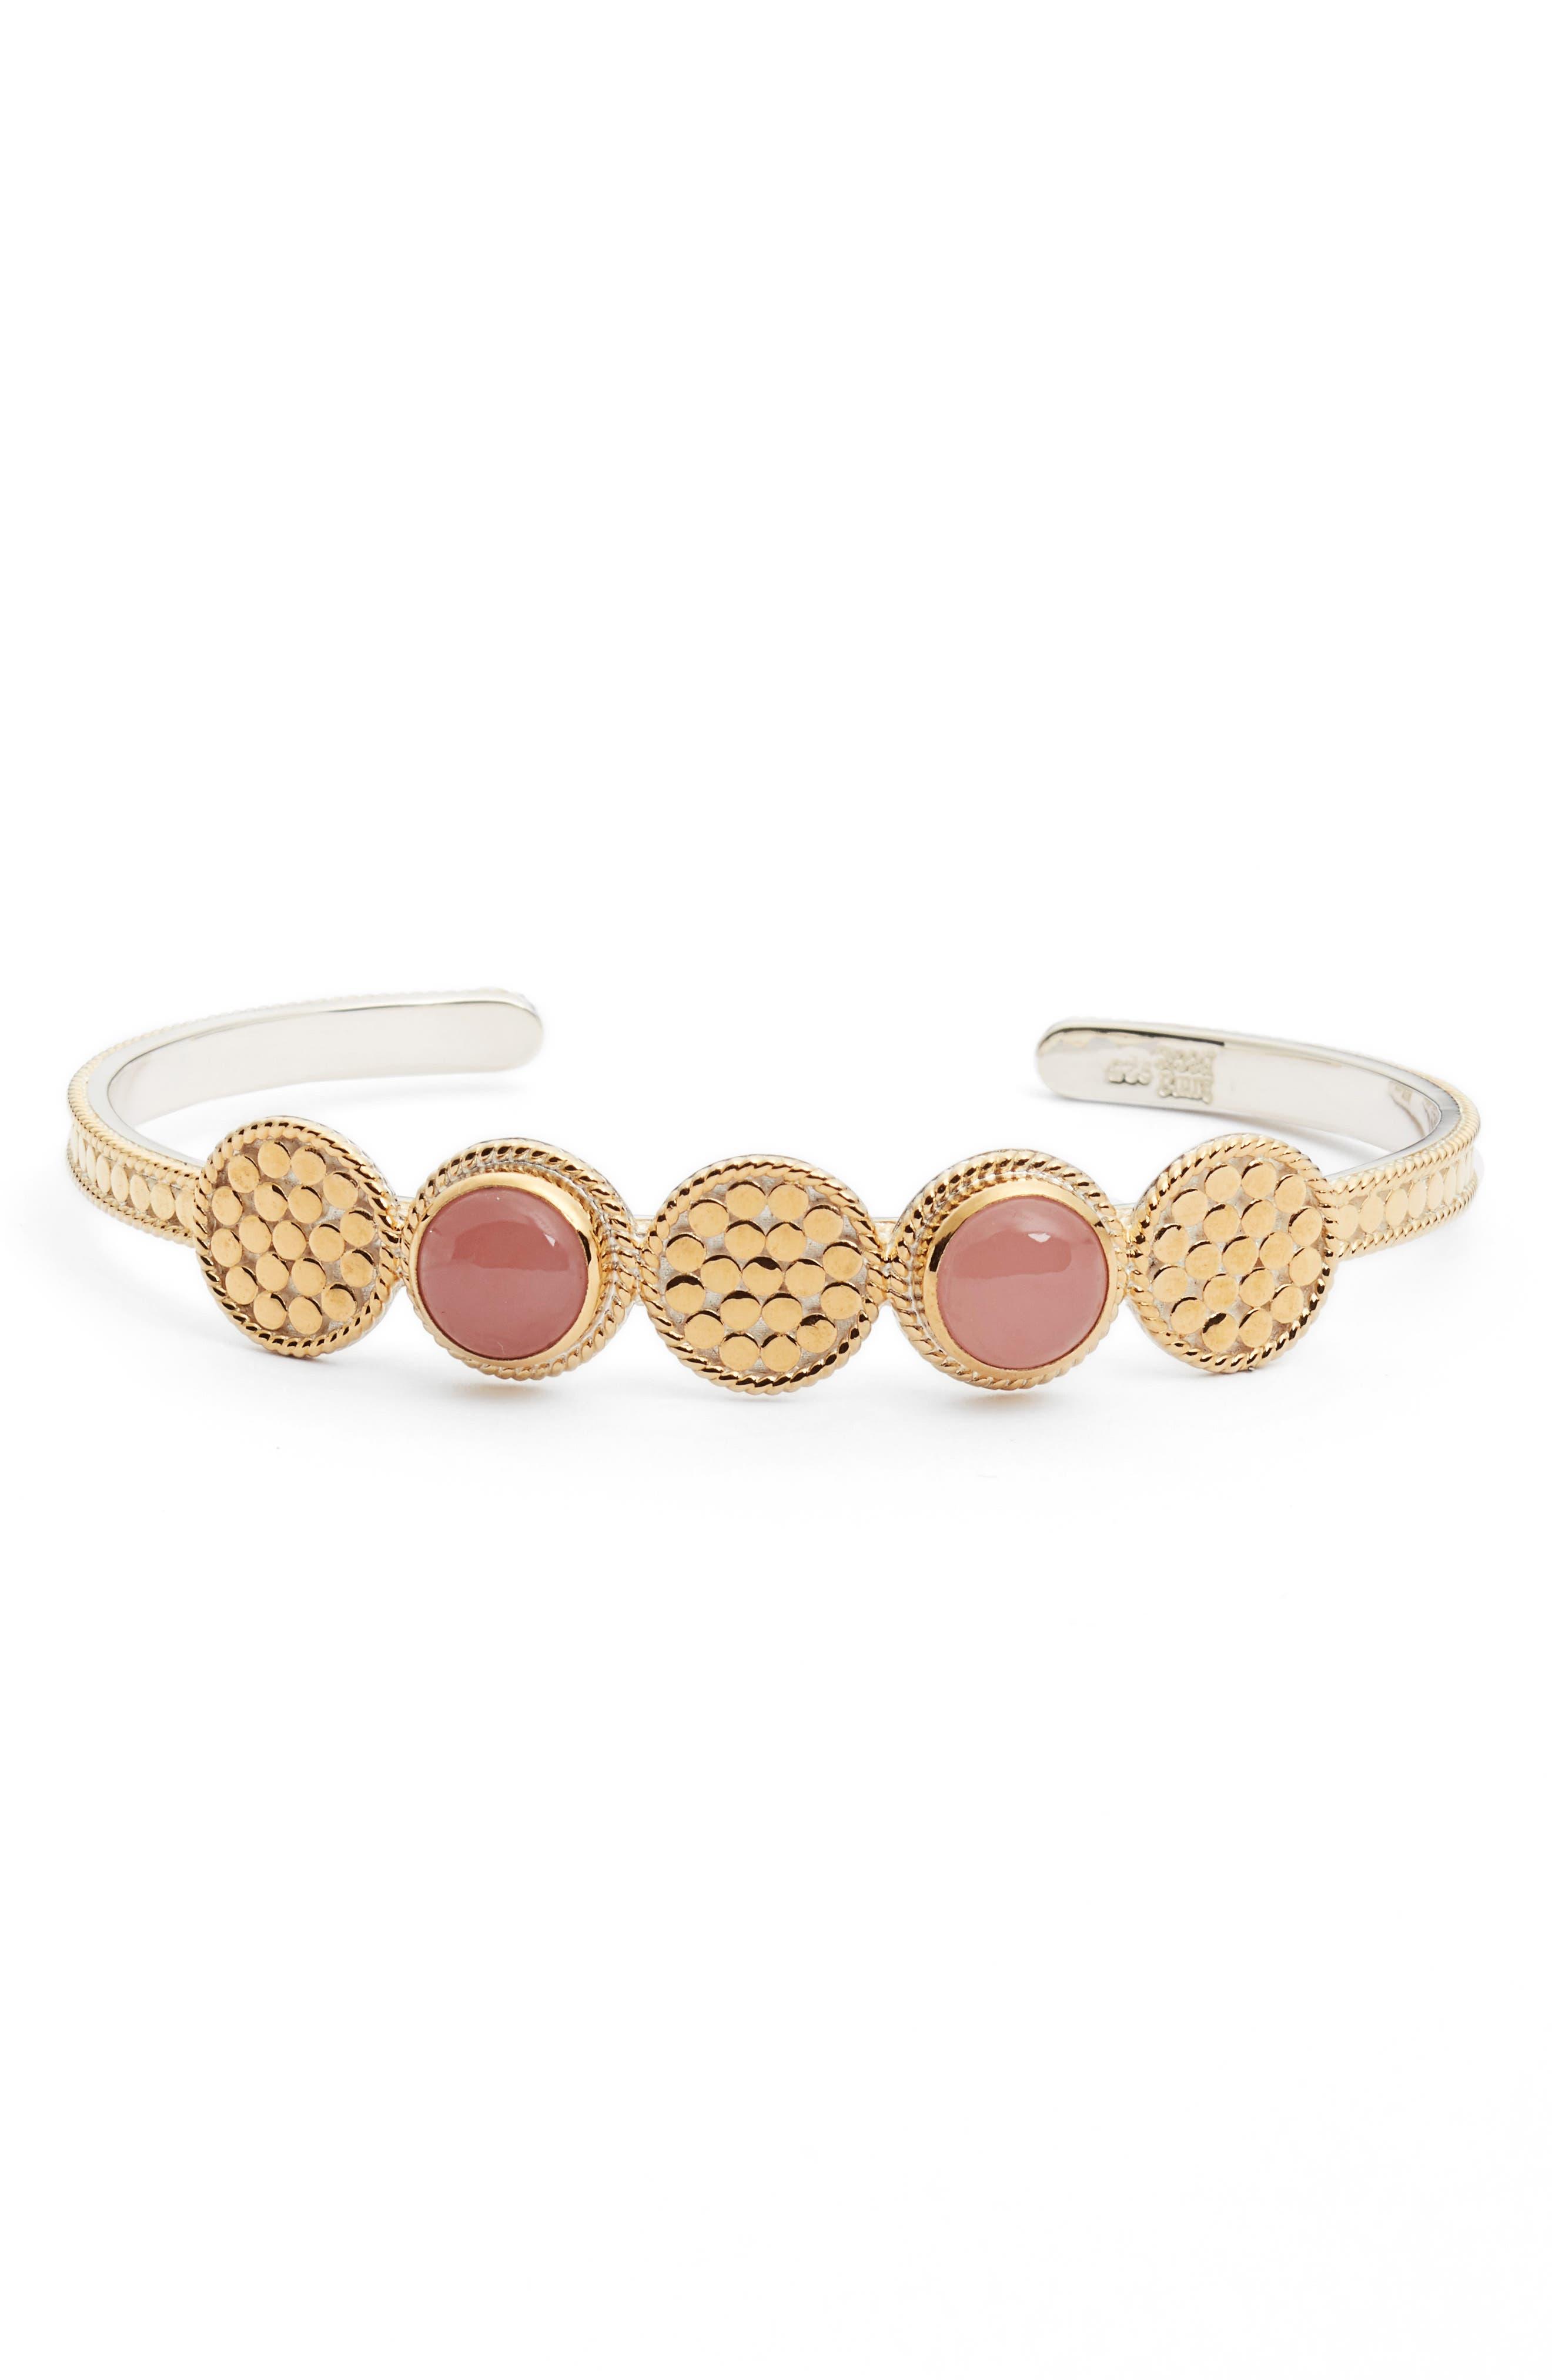 Guava Quartz Multidisc Cuff Bracelet,                         Main,                         color, Gold/ Guava Quartz